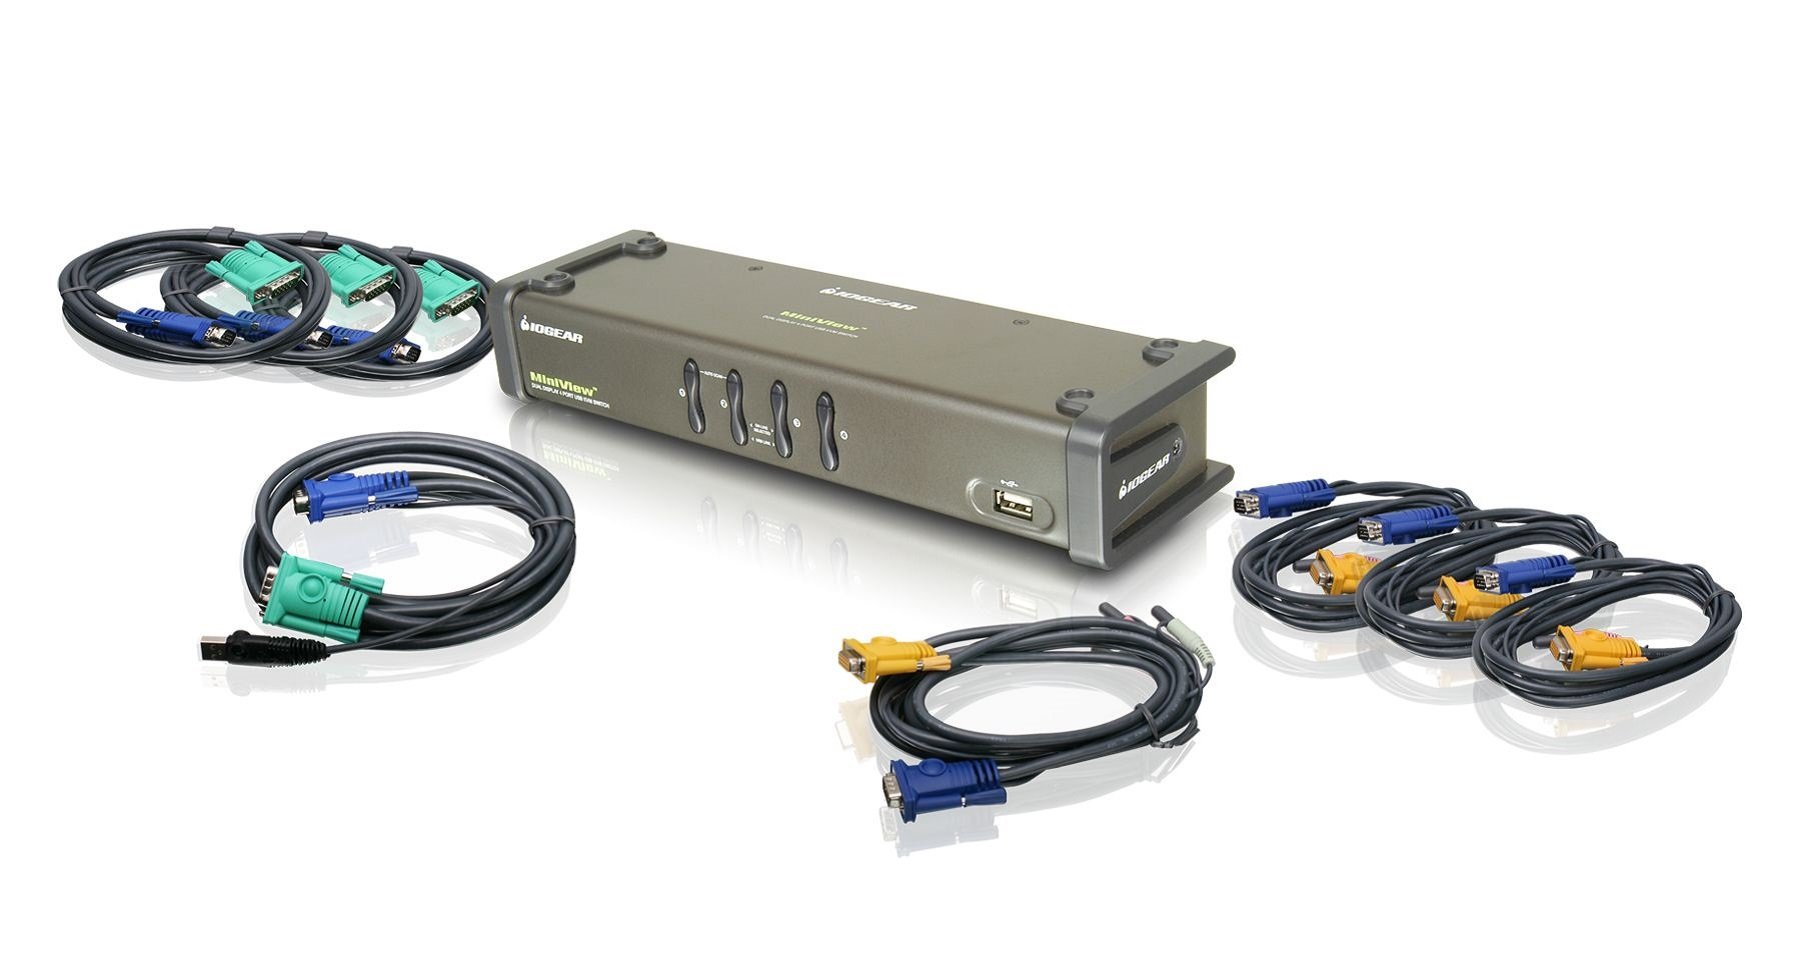 IOGEAR 4-Port DualView USB VGA KVMP Switch with Audio and Cables, TAA Compliant, GCS1744